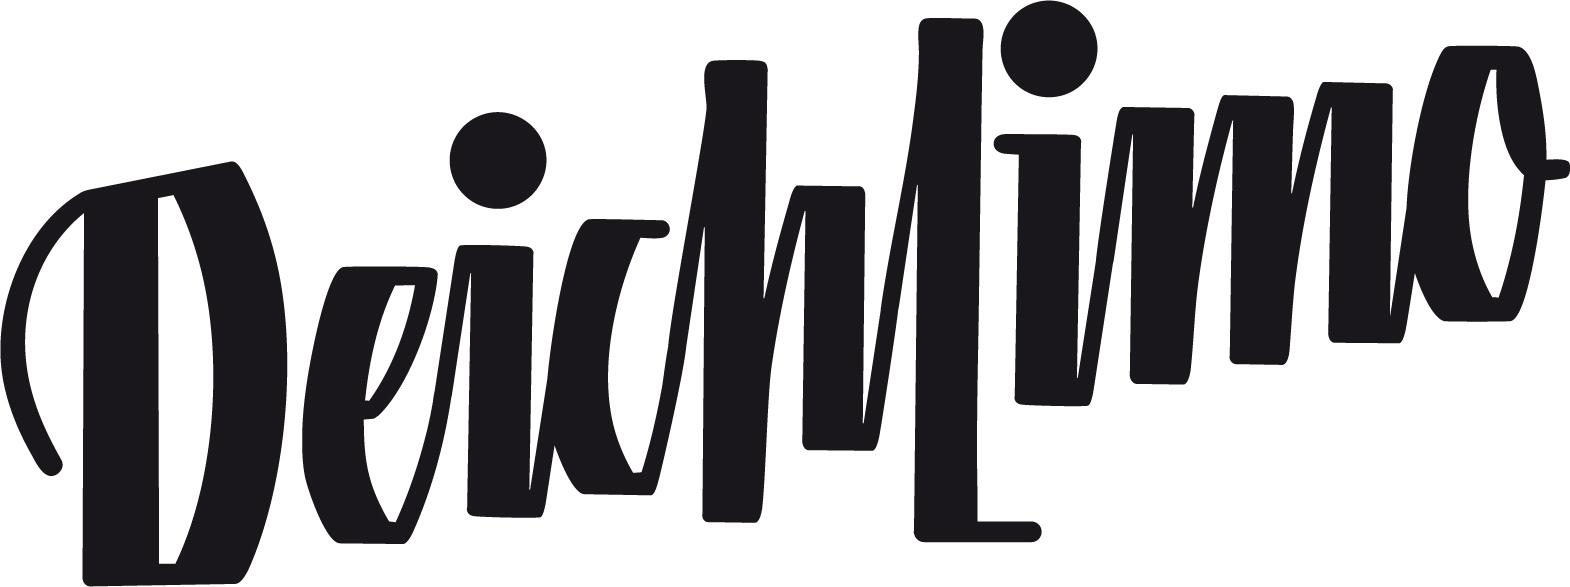 Deichlimo Logo